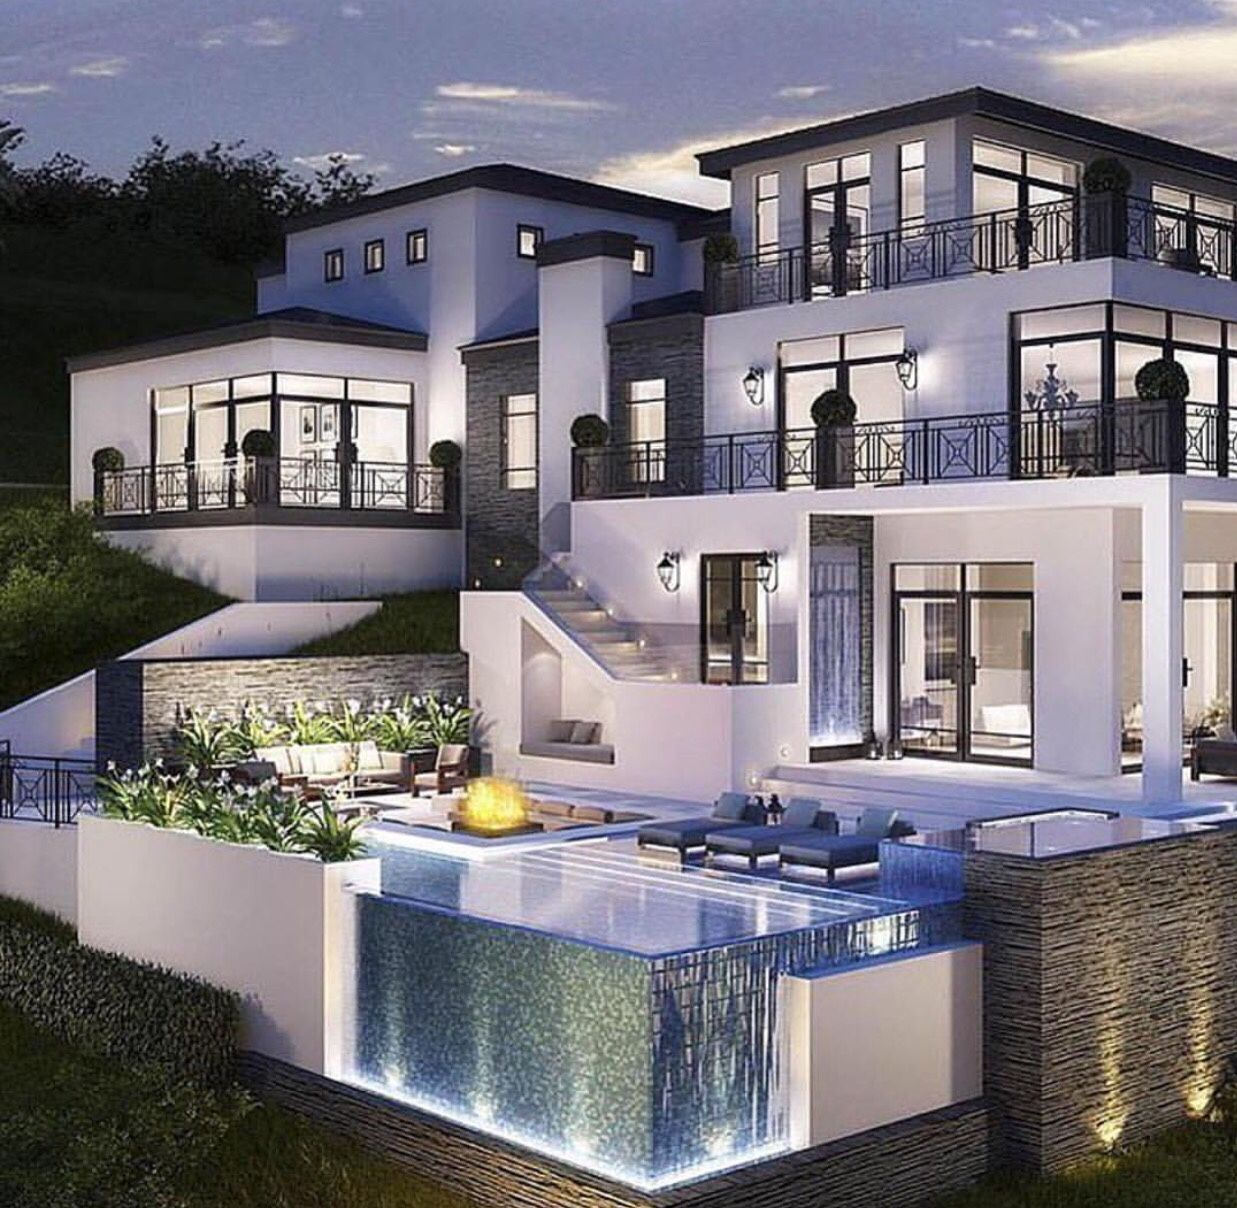 Big dreams  amp luxury taste photo homes dream houses modern house also pin by amanda barrett on anna in pinterest rh